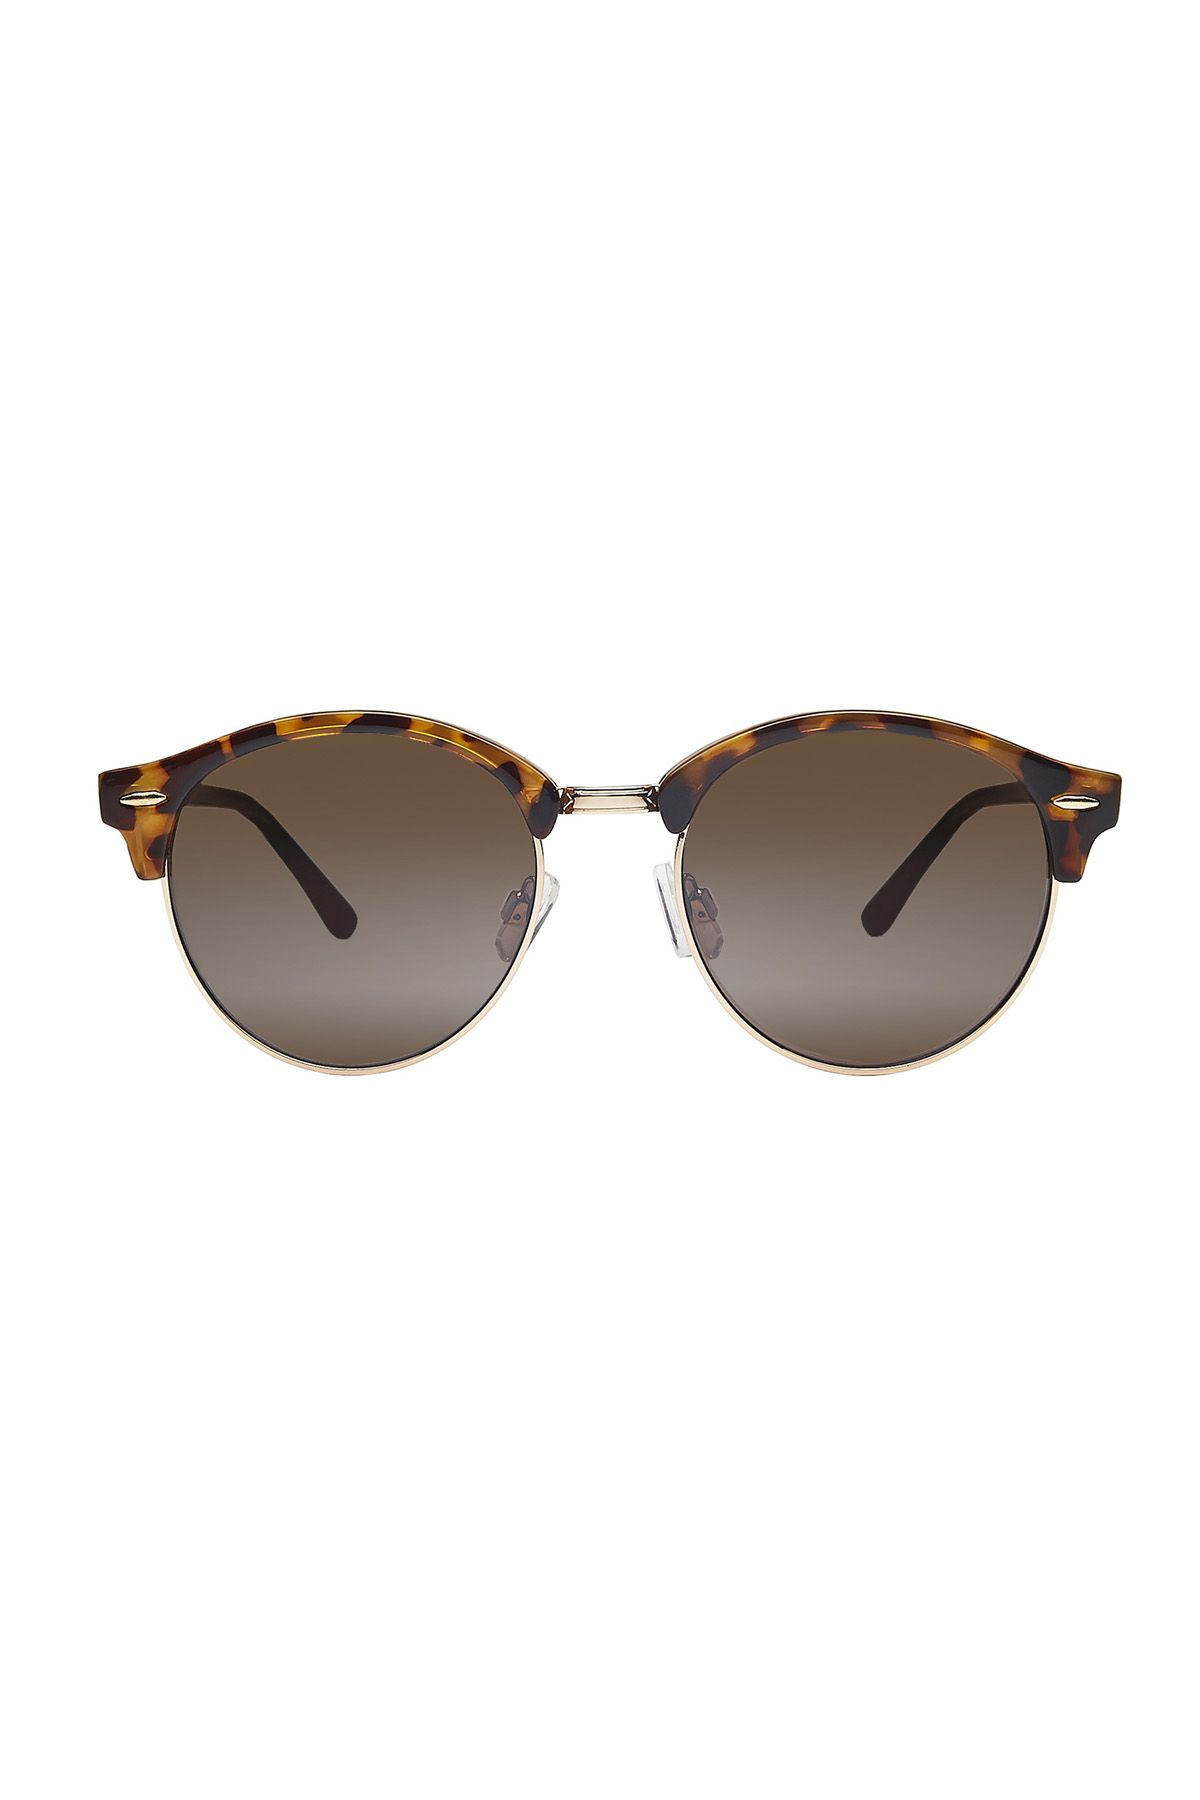 best friend gifts sunglasses